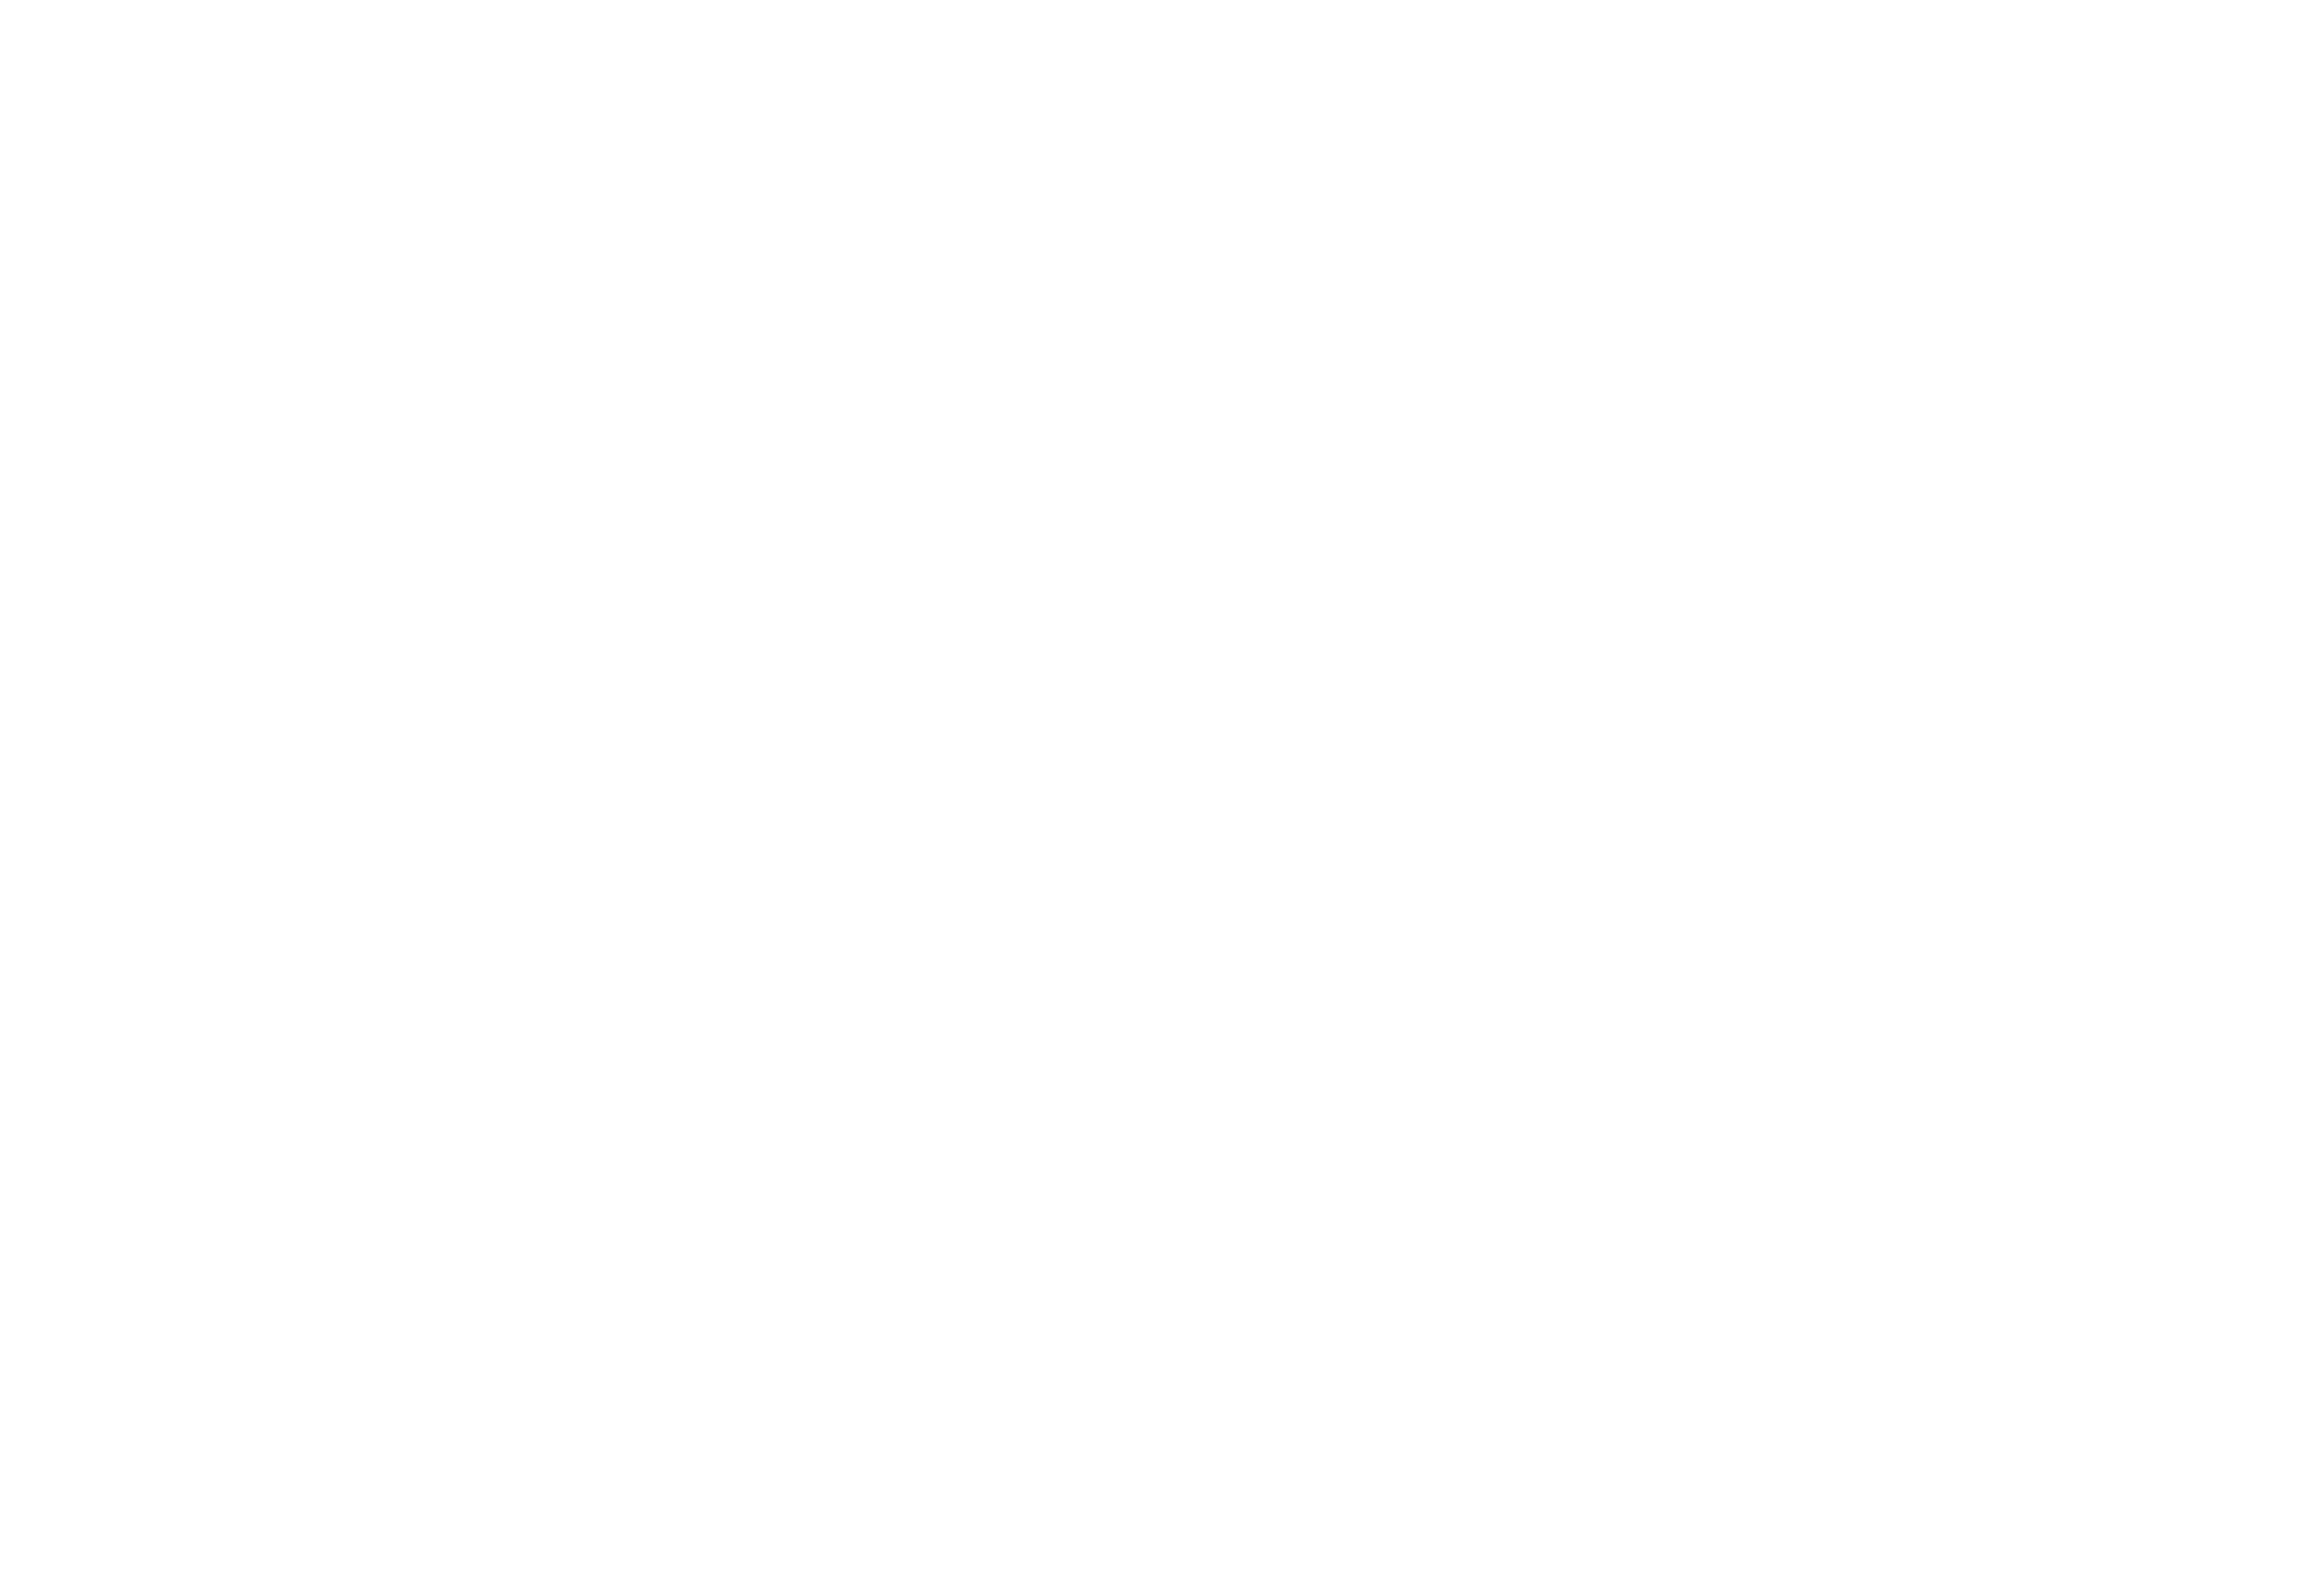 Eulalia Amell Doula